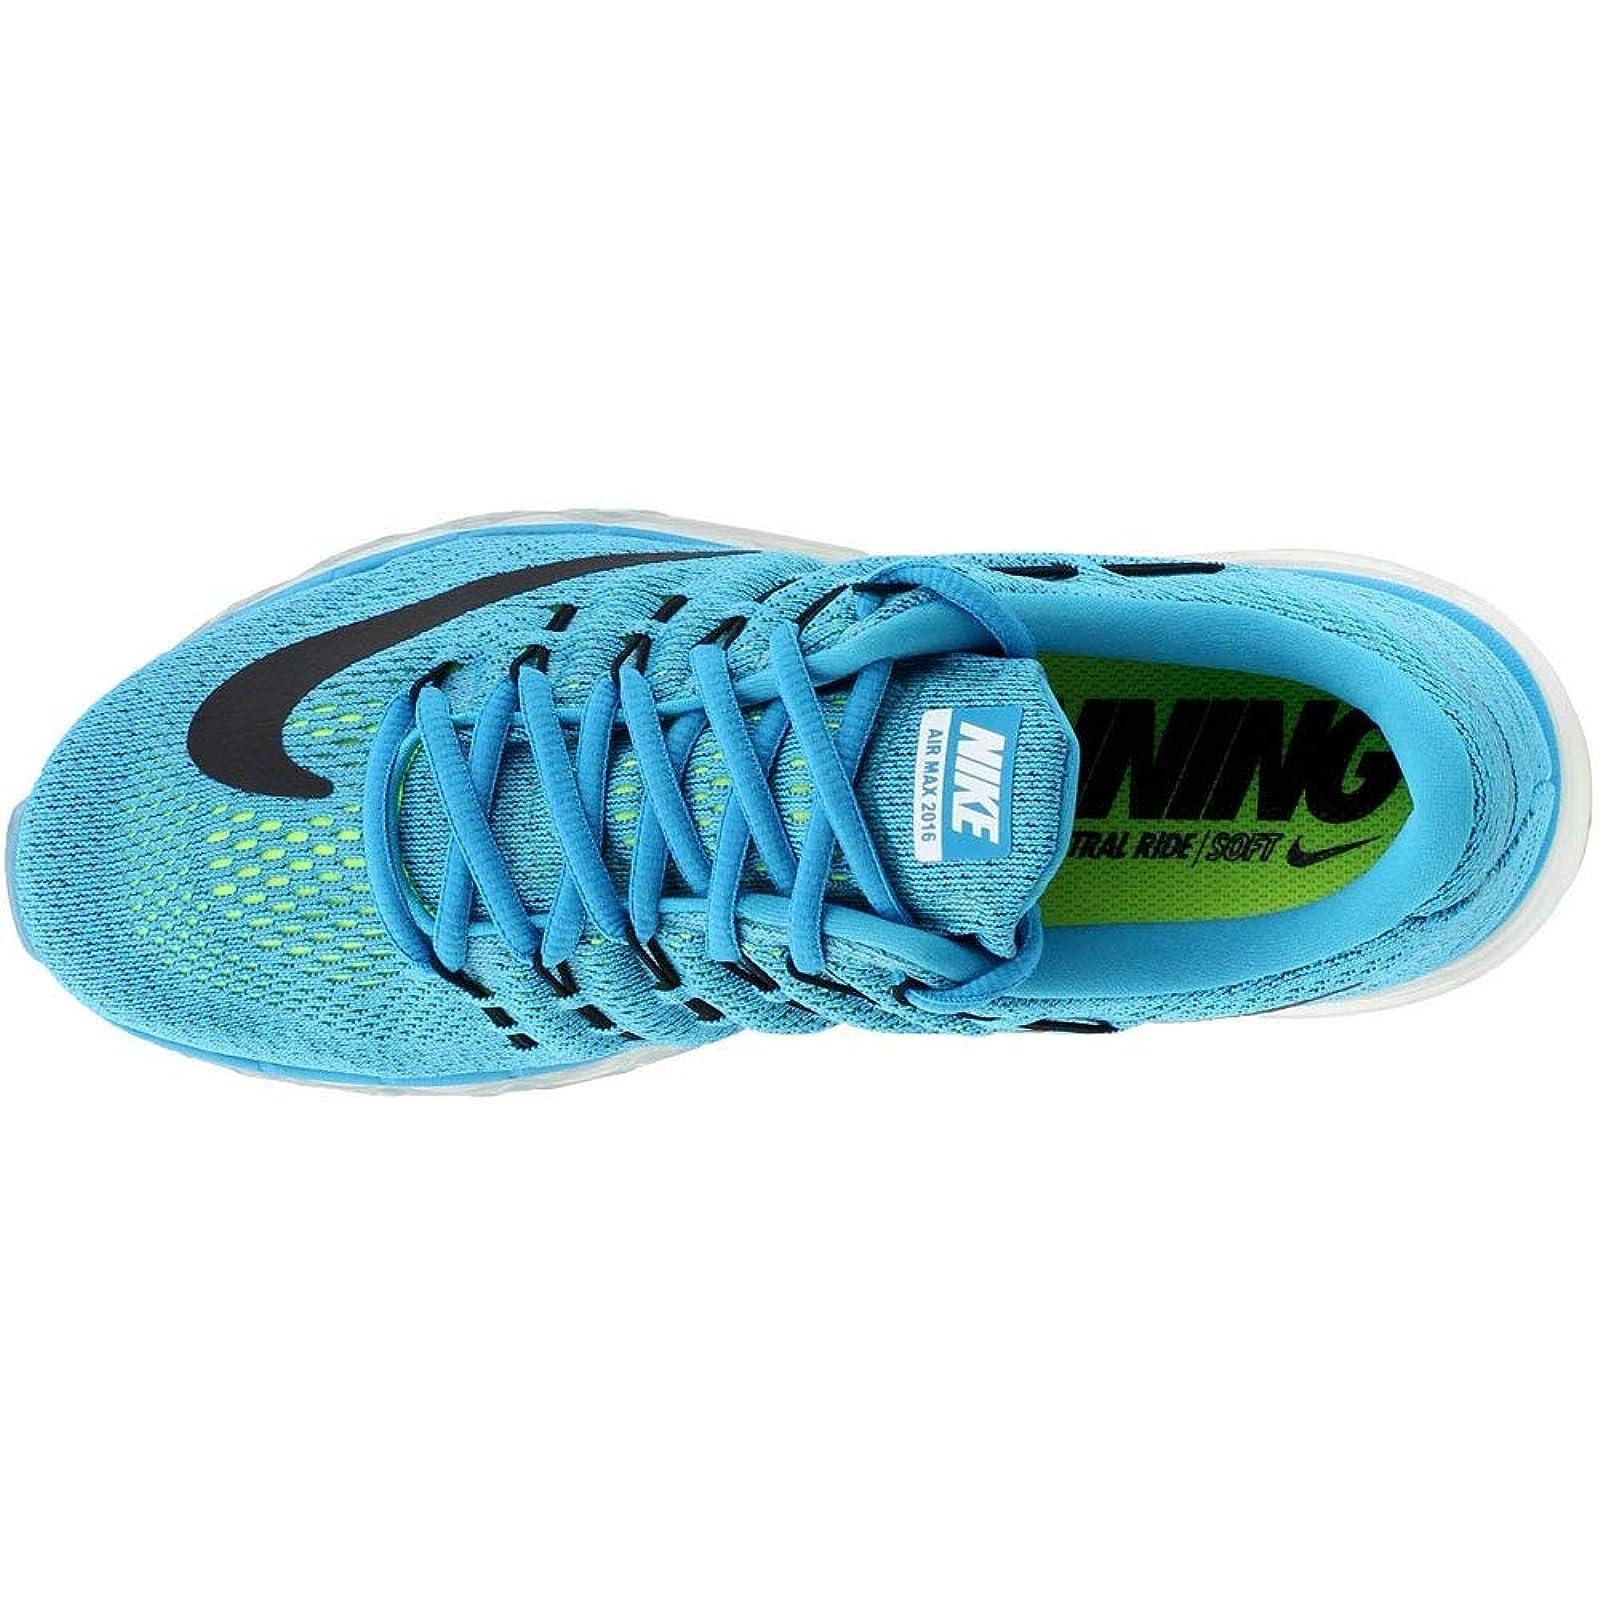 Nike Men's Air Max 2016 Running Shoe 8 M US - 5